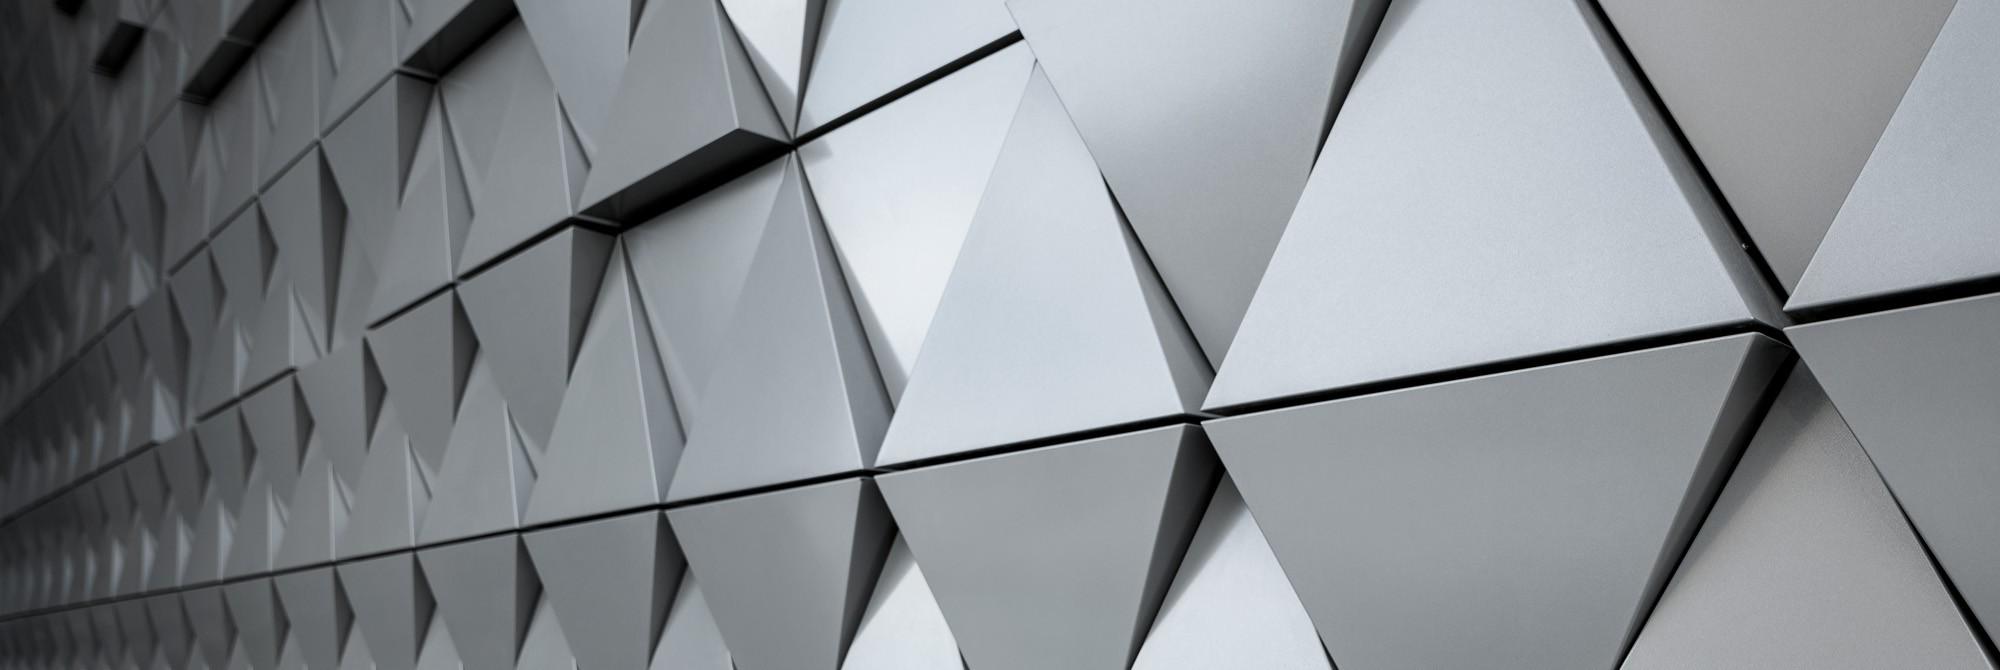 KömaSteel Stahlverbundplatten